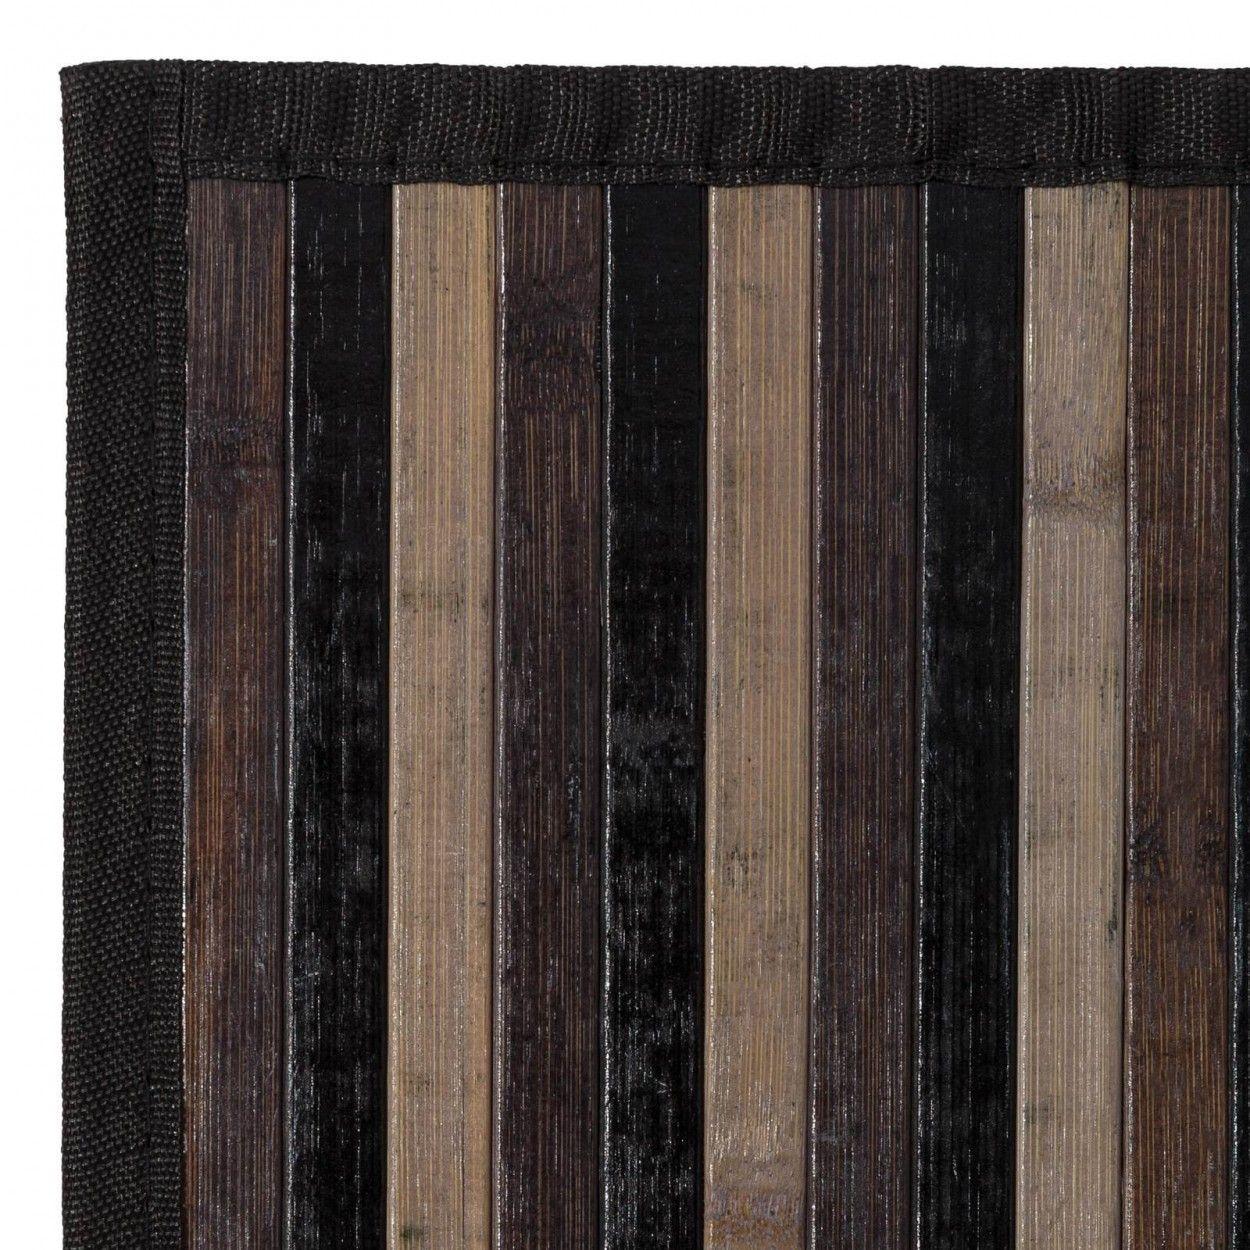 Comprar alfmbra de bambu con rayas en tono gris hogar y mas - Alfombras bambu colores ...